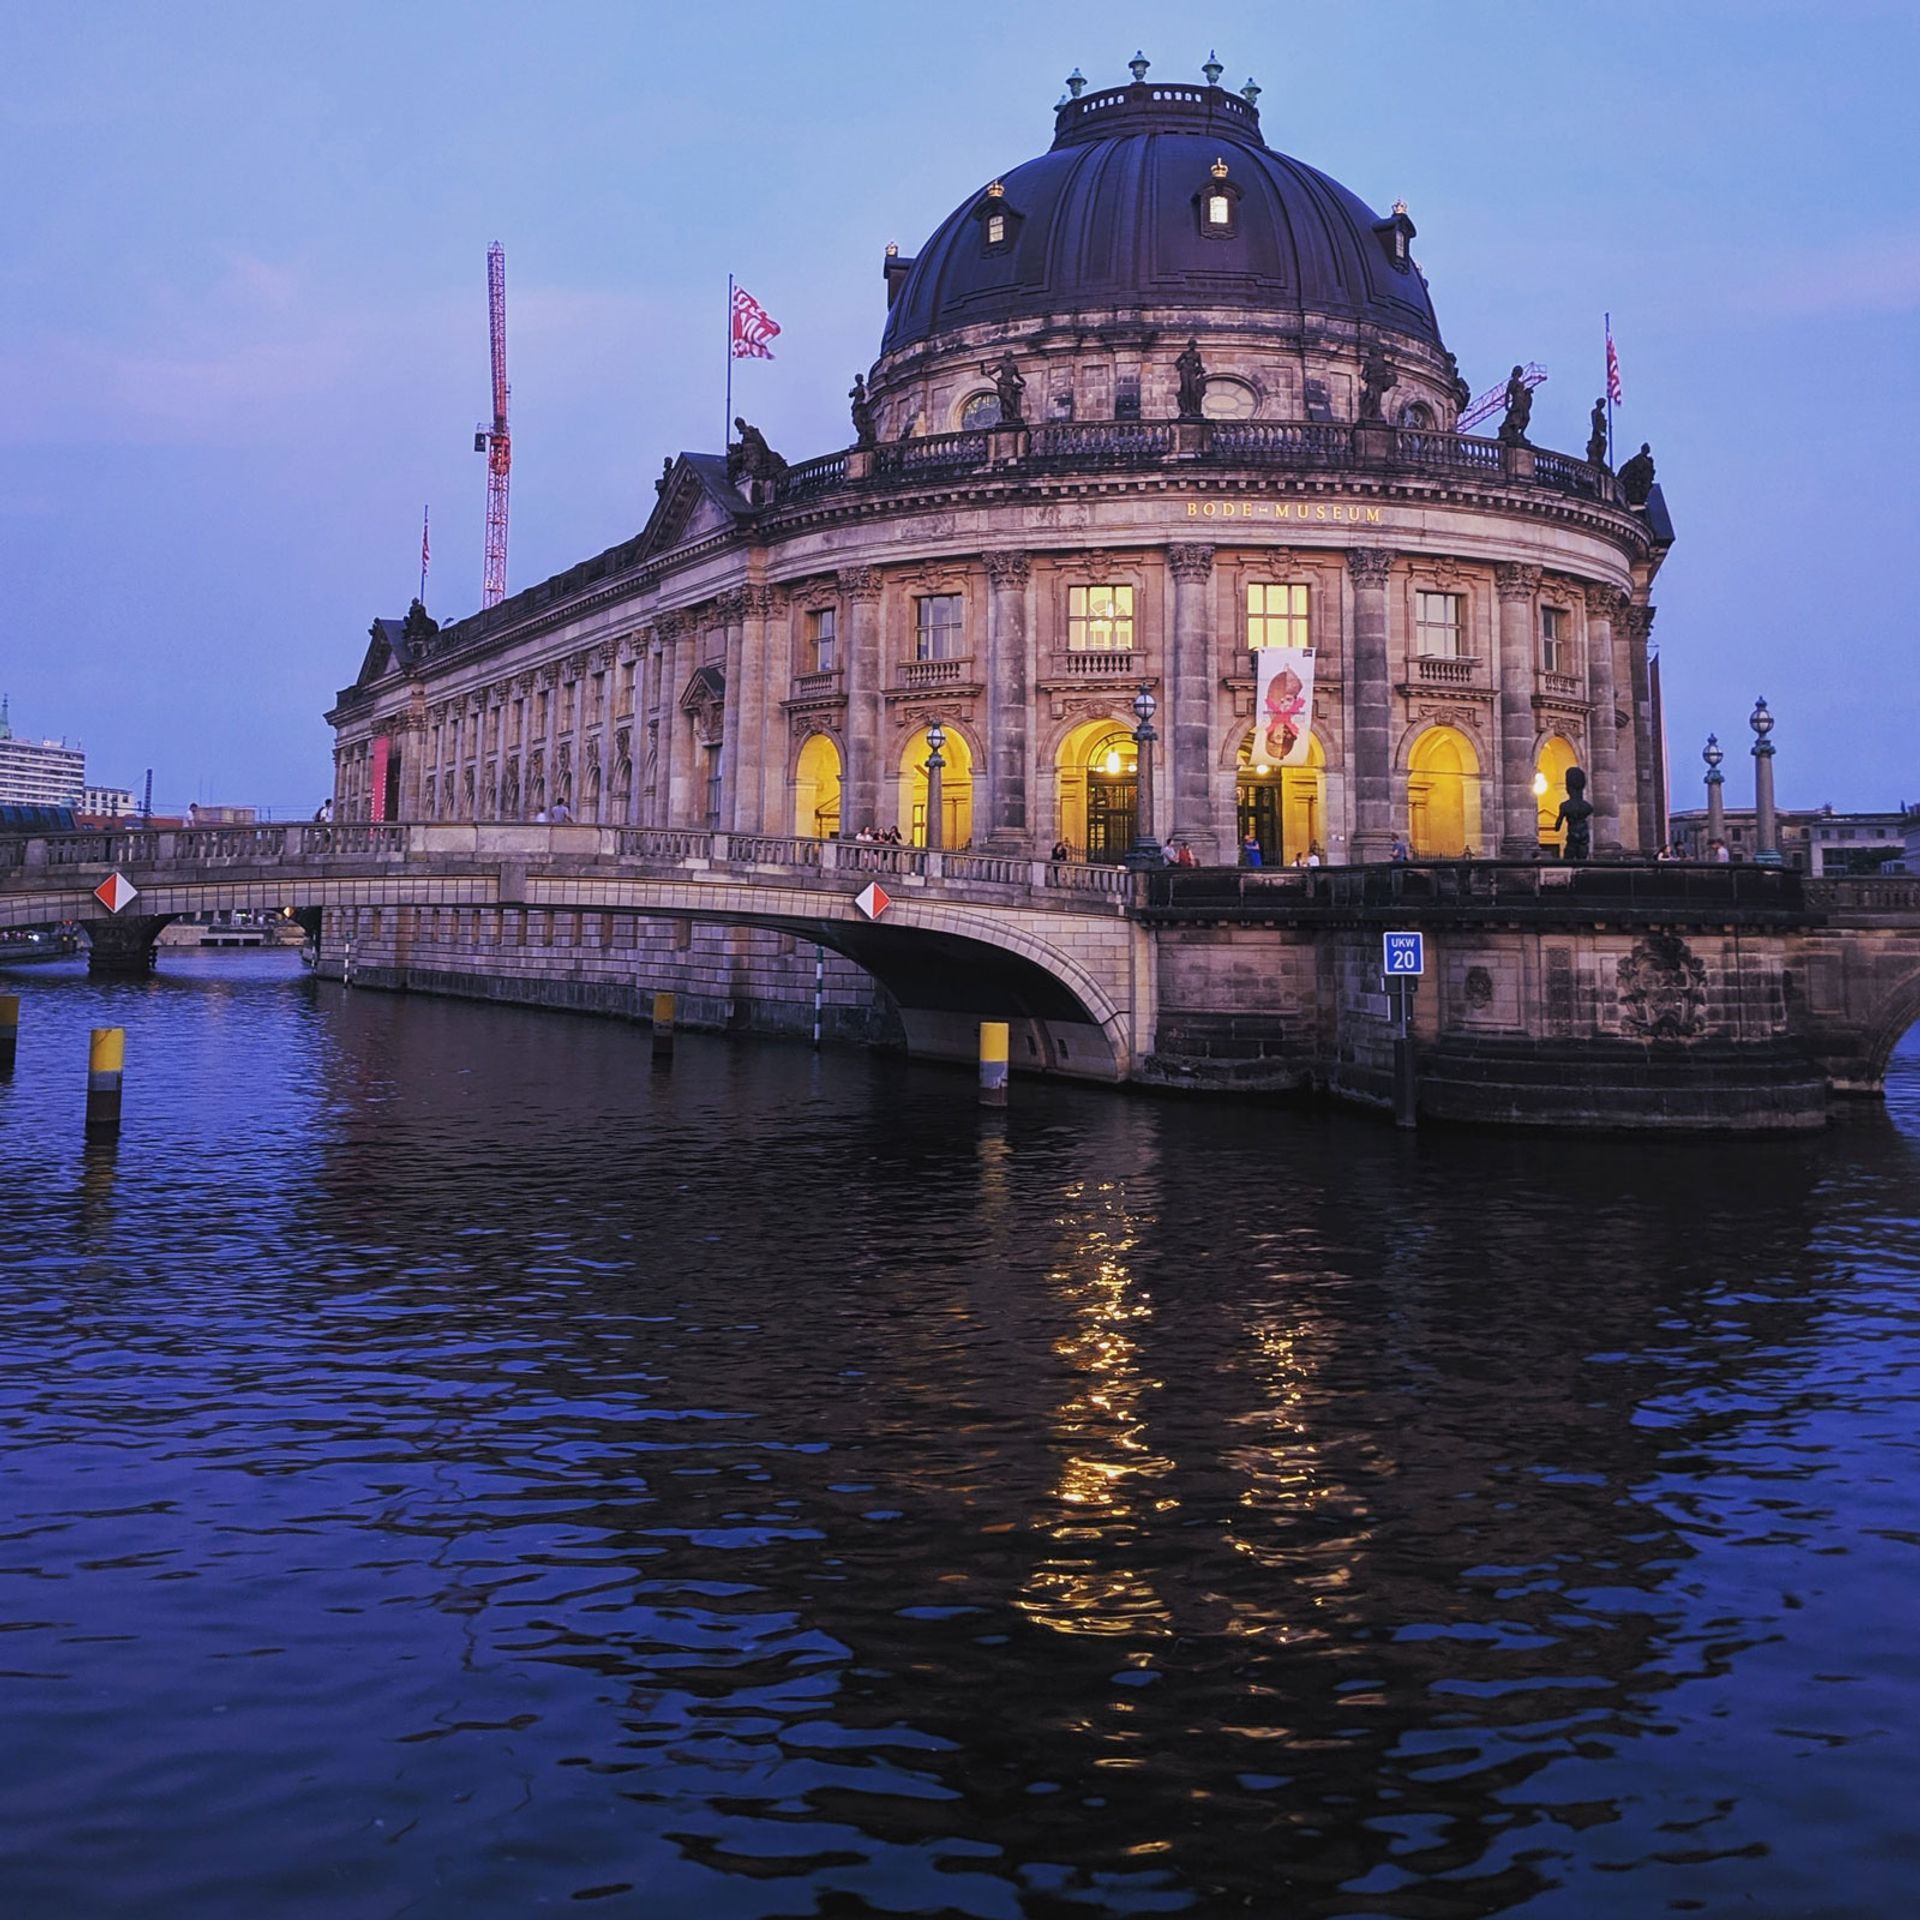 Berlin's museums will close until at least 19 April because of coronavirus © Alana Harris